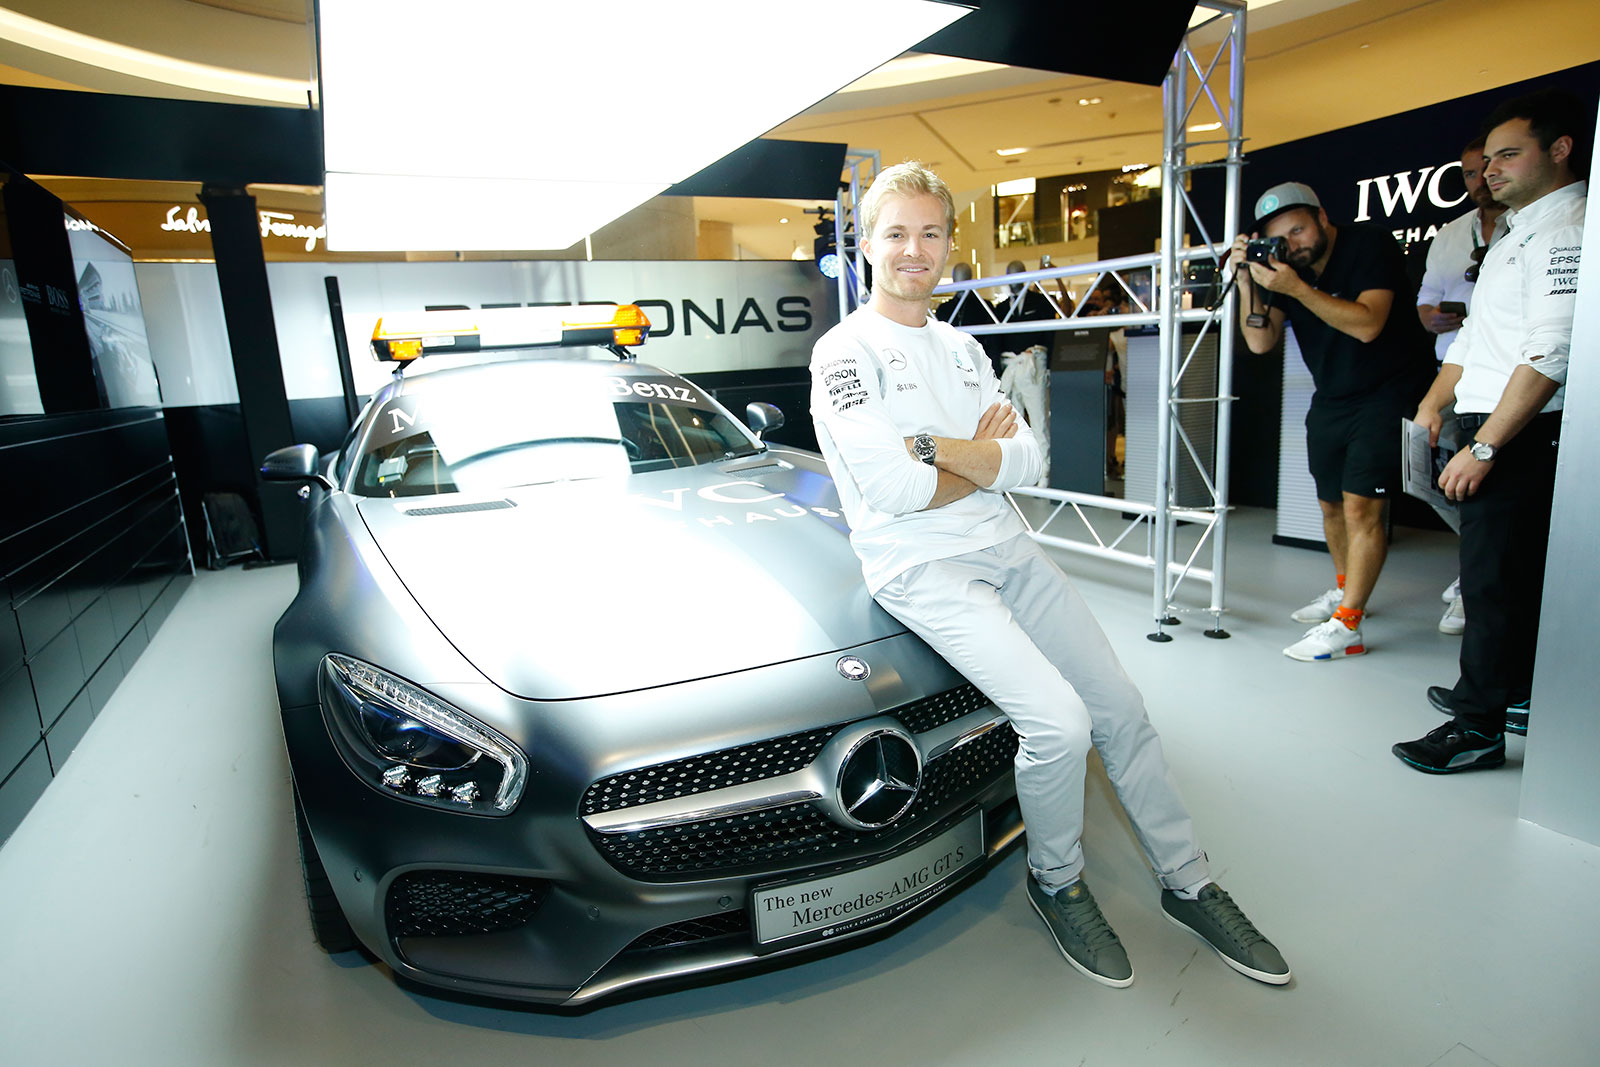 IWC Singapore Grand Prix 2016 Nico Rosberg 3